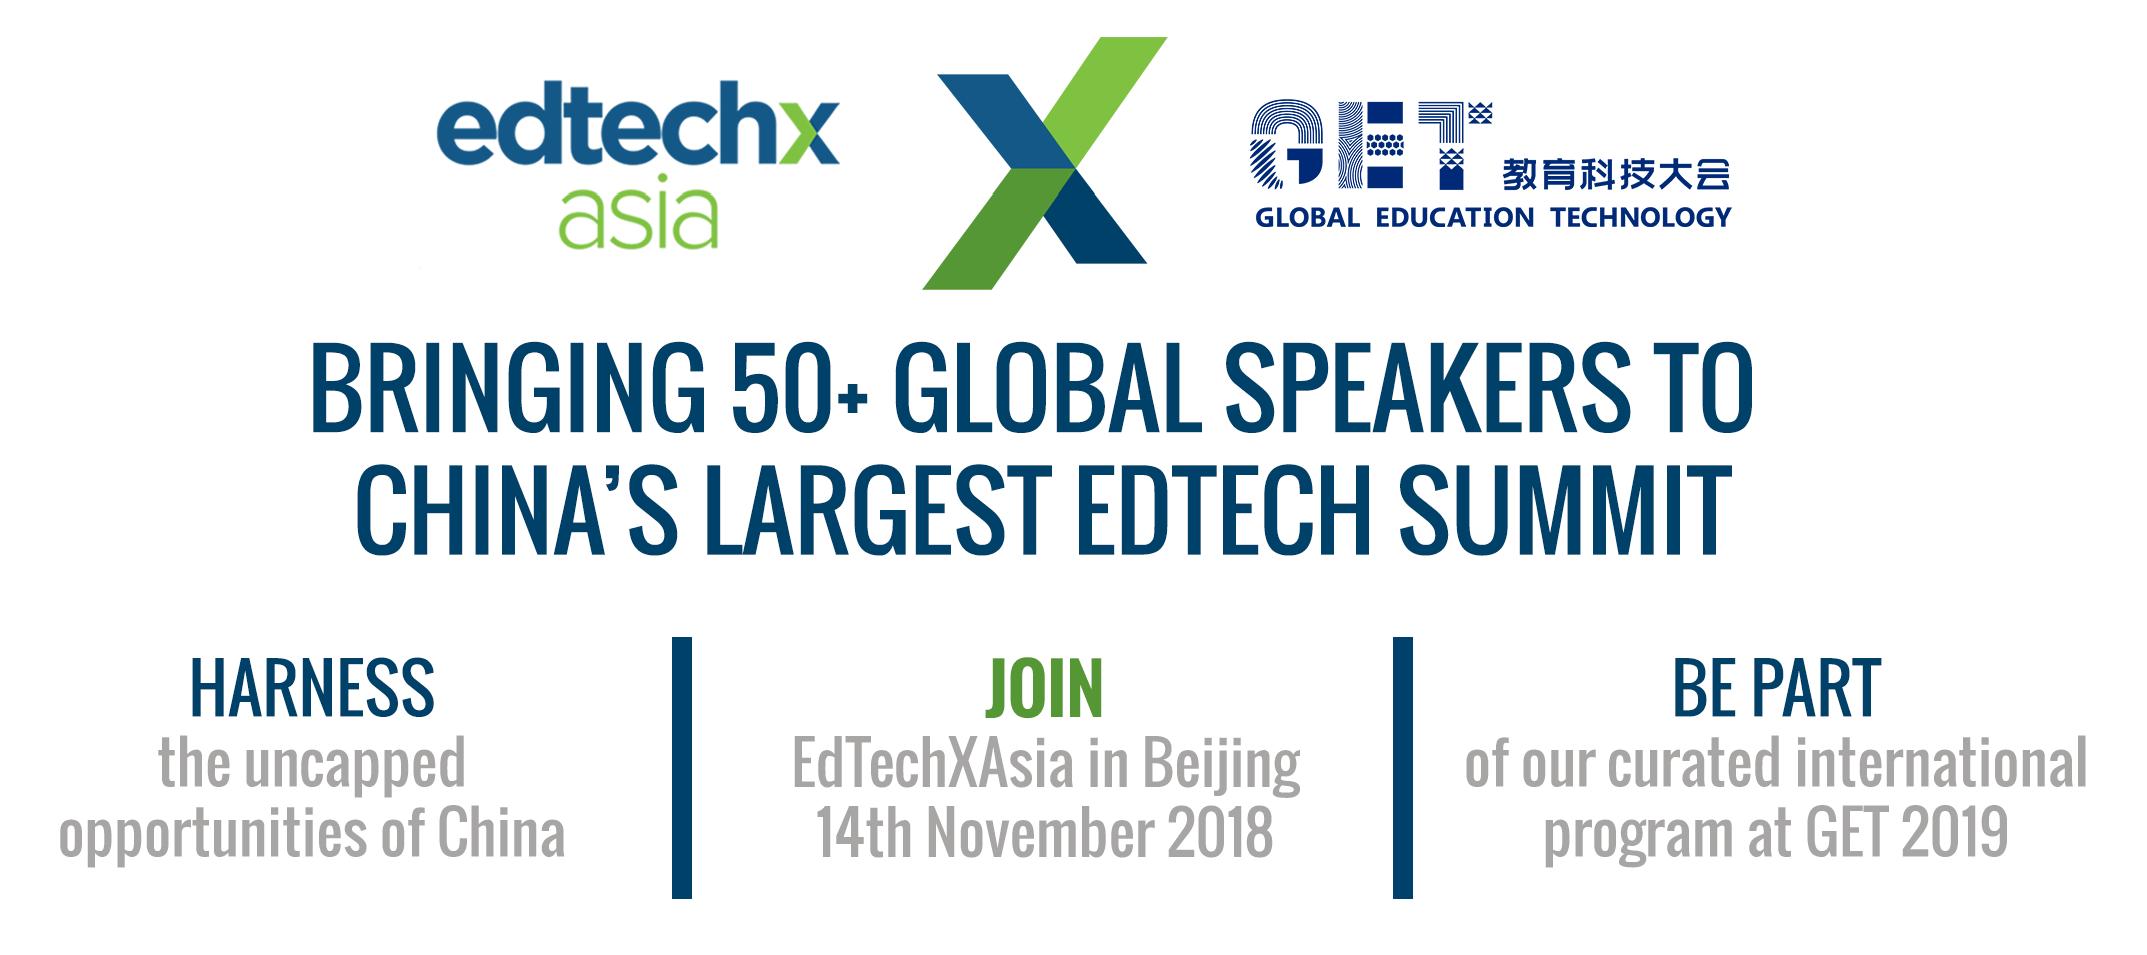 EdTechX Asia @ GET 2018